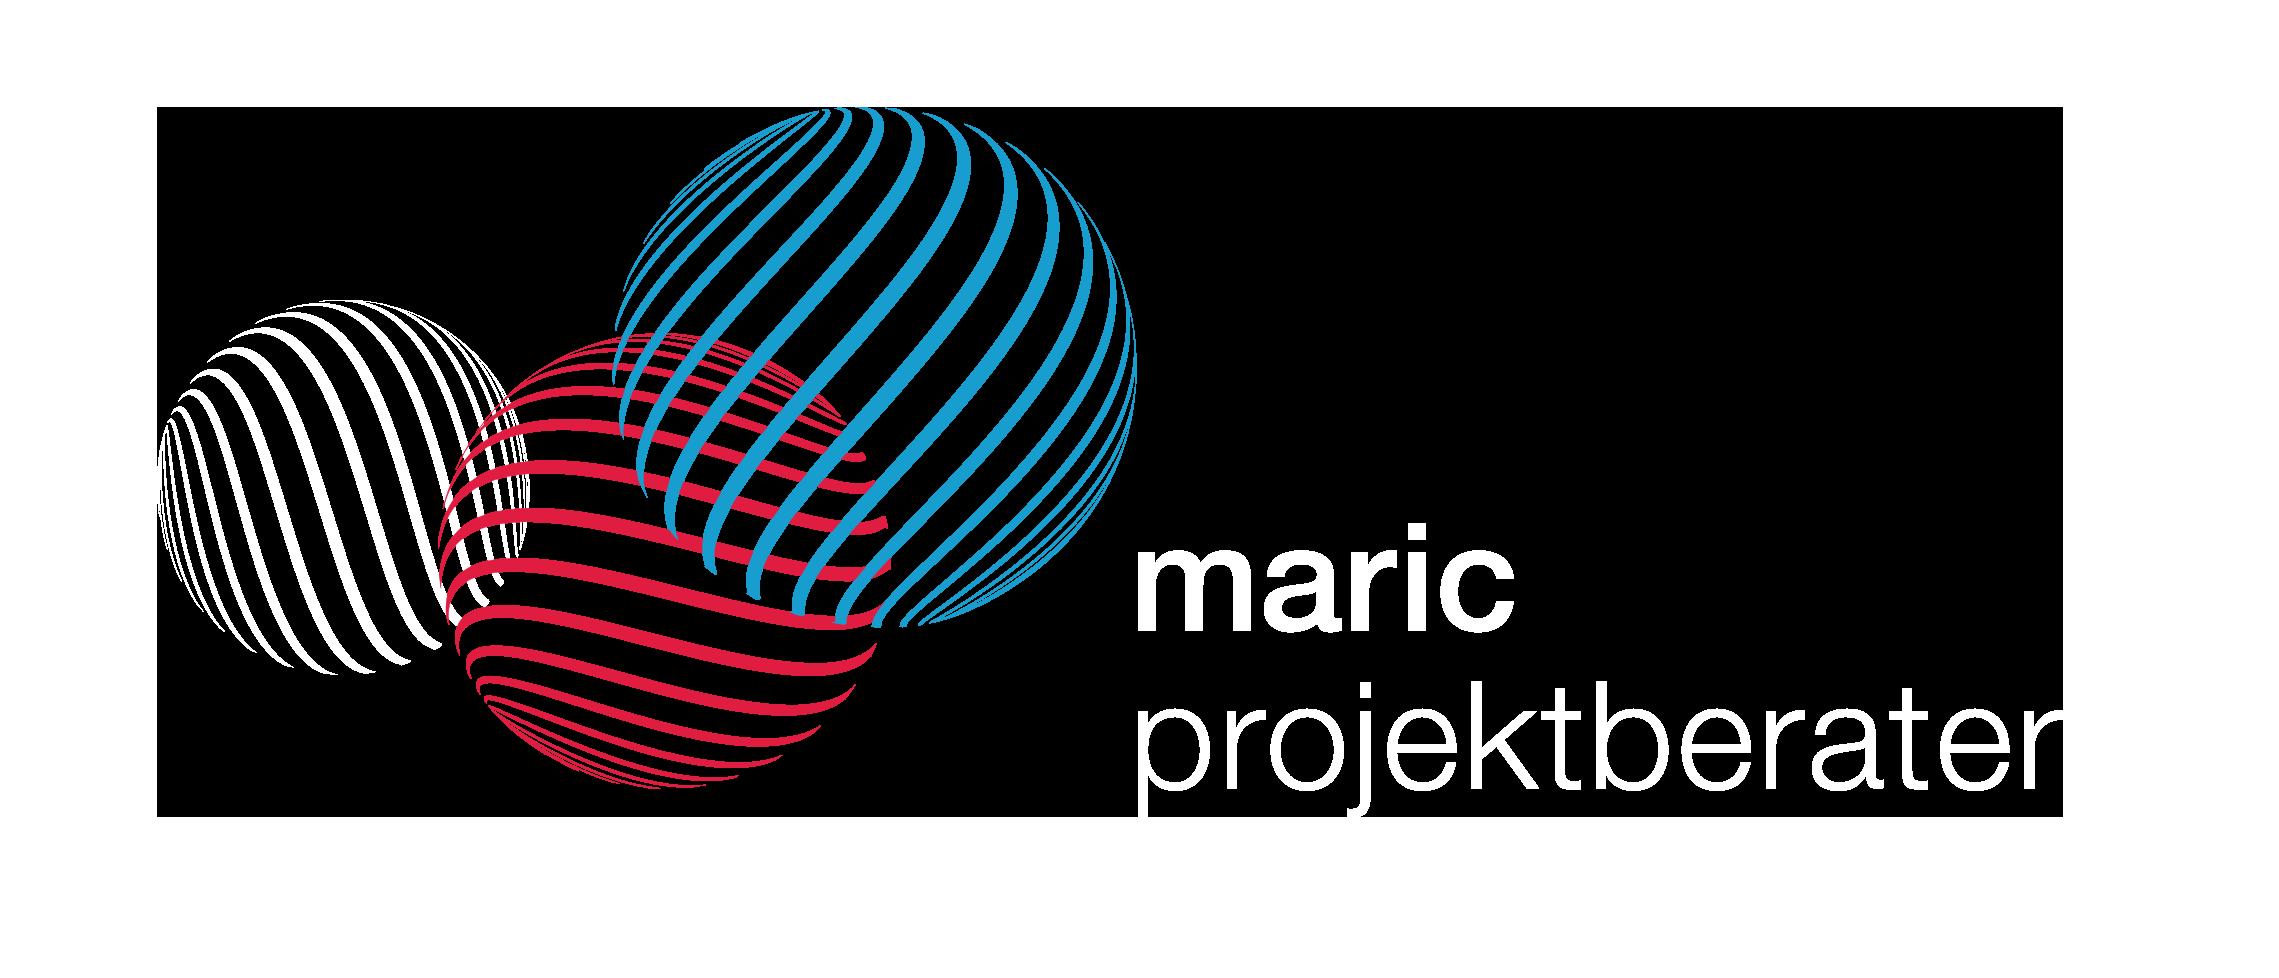 Projektberater